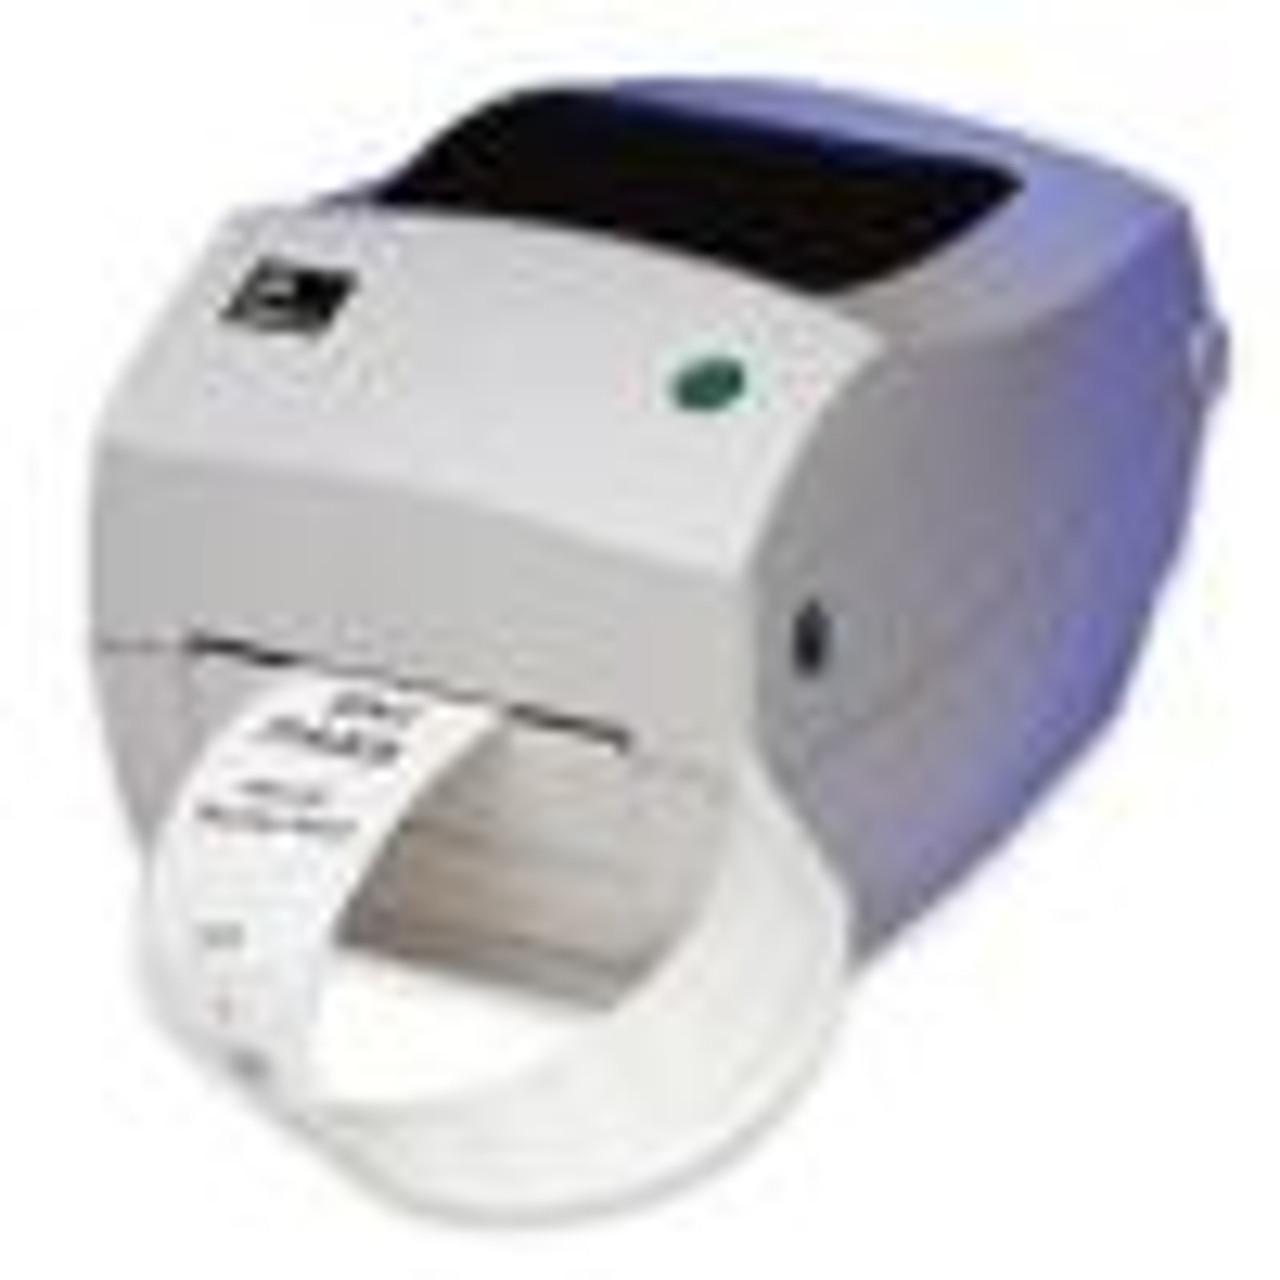 R2844-Z Printers